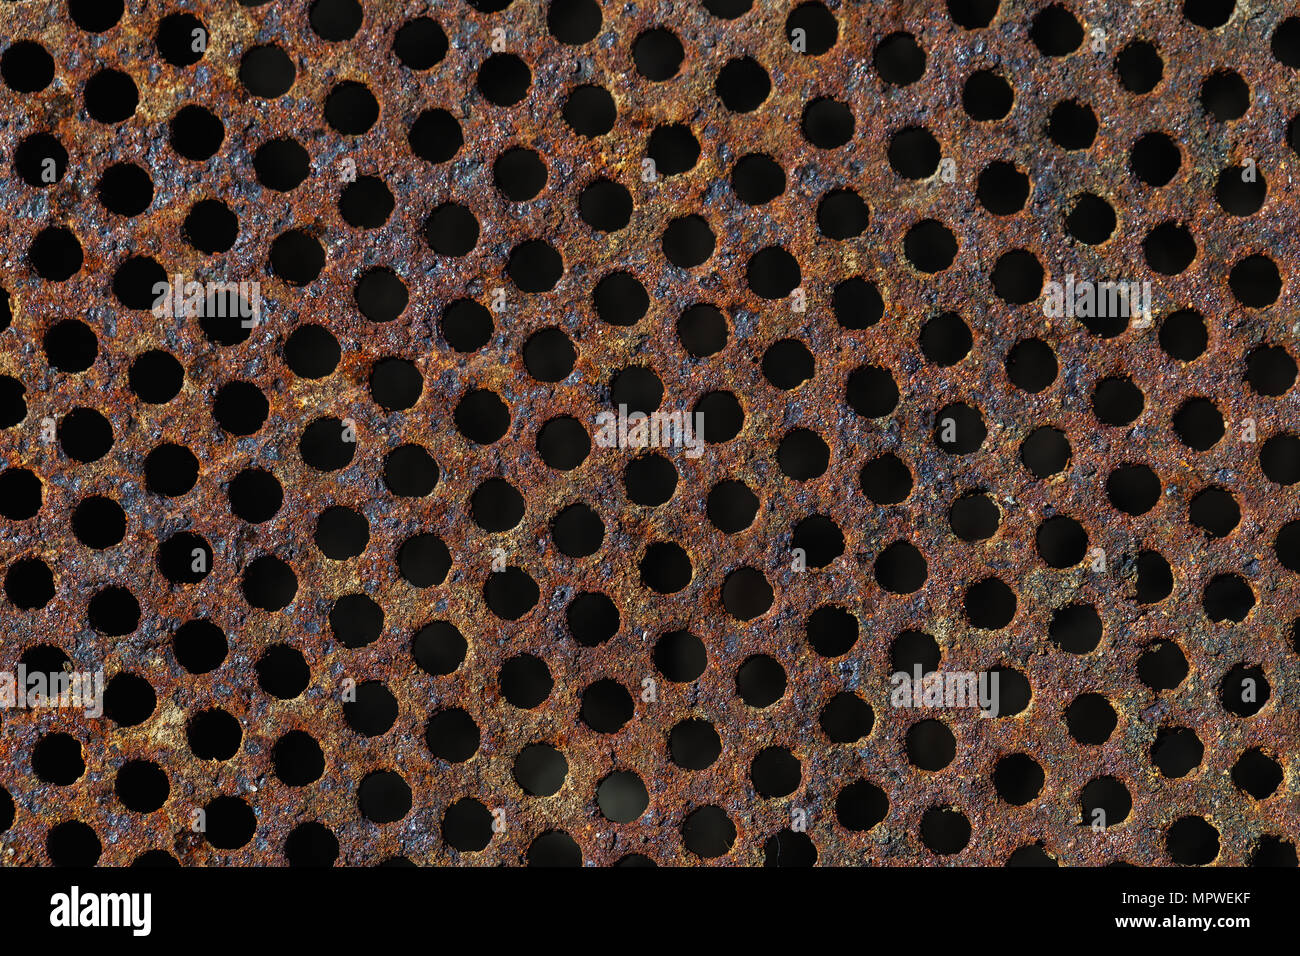 Texture of a rusty metal grid, closeup - Stock Image